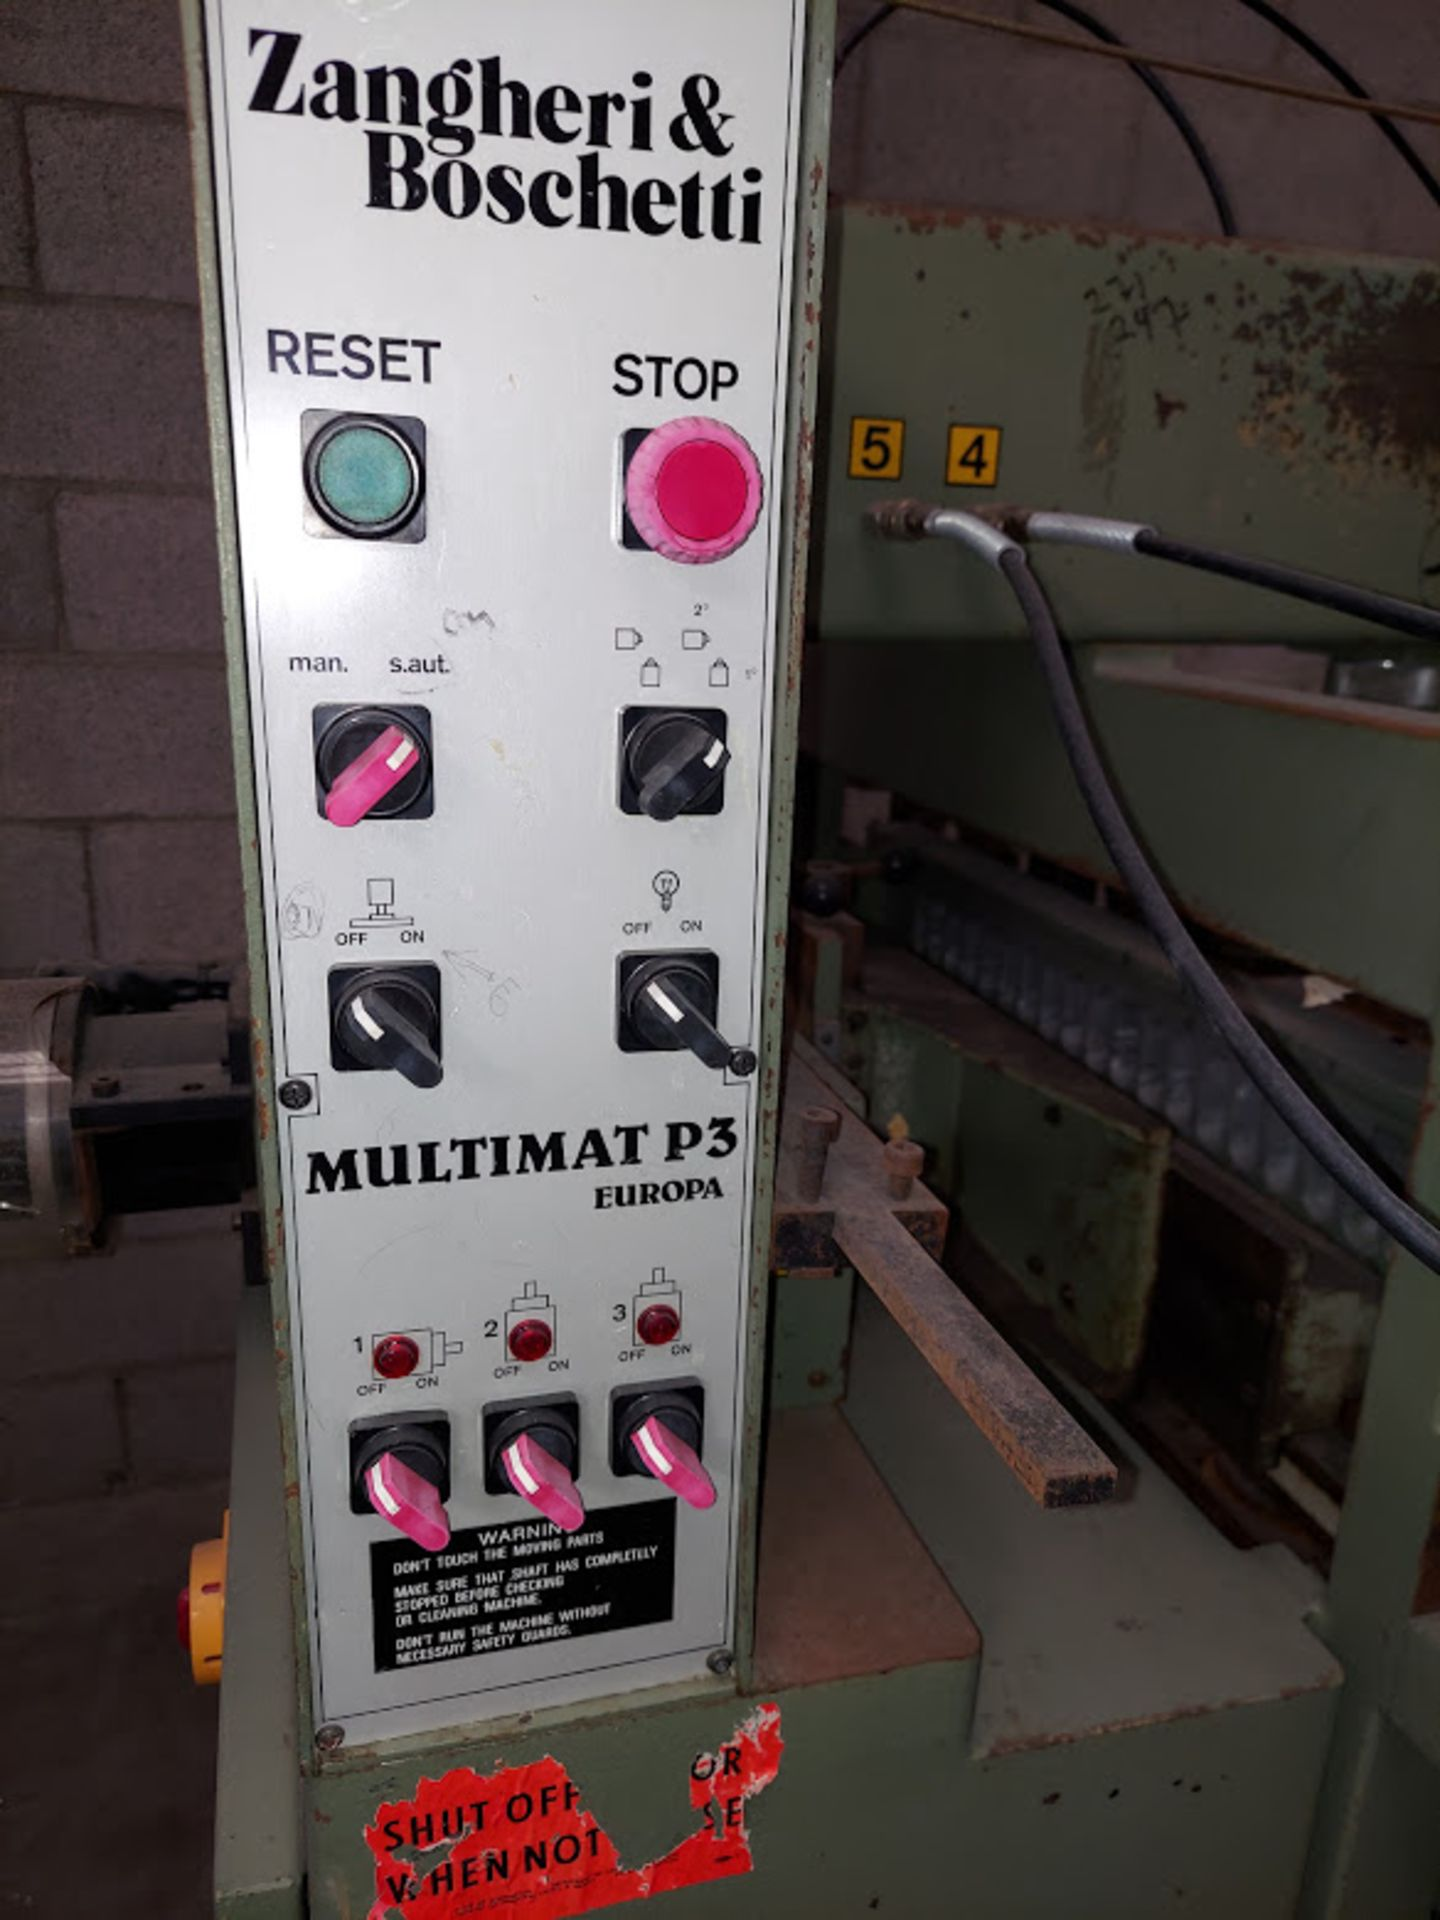 Zangheri & Boschetti Mulit Mat P3 Line Boring Machine, Model #MP3, 1 - 21 Spindle Horizontal Drill - Image 4 of 7